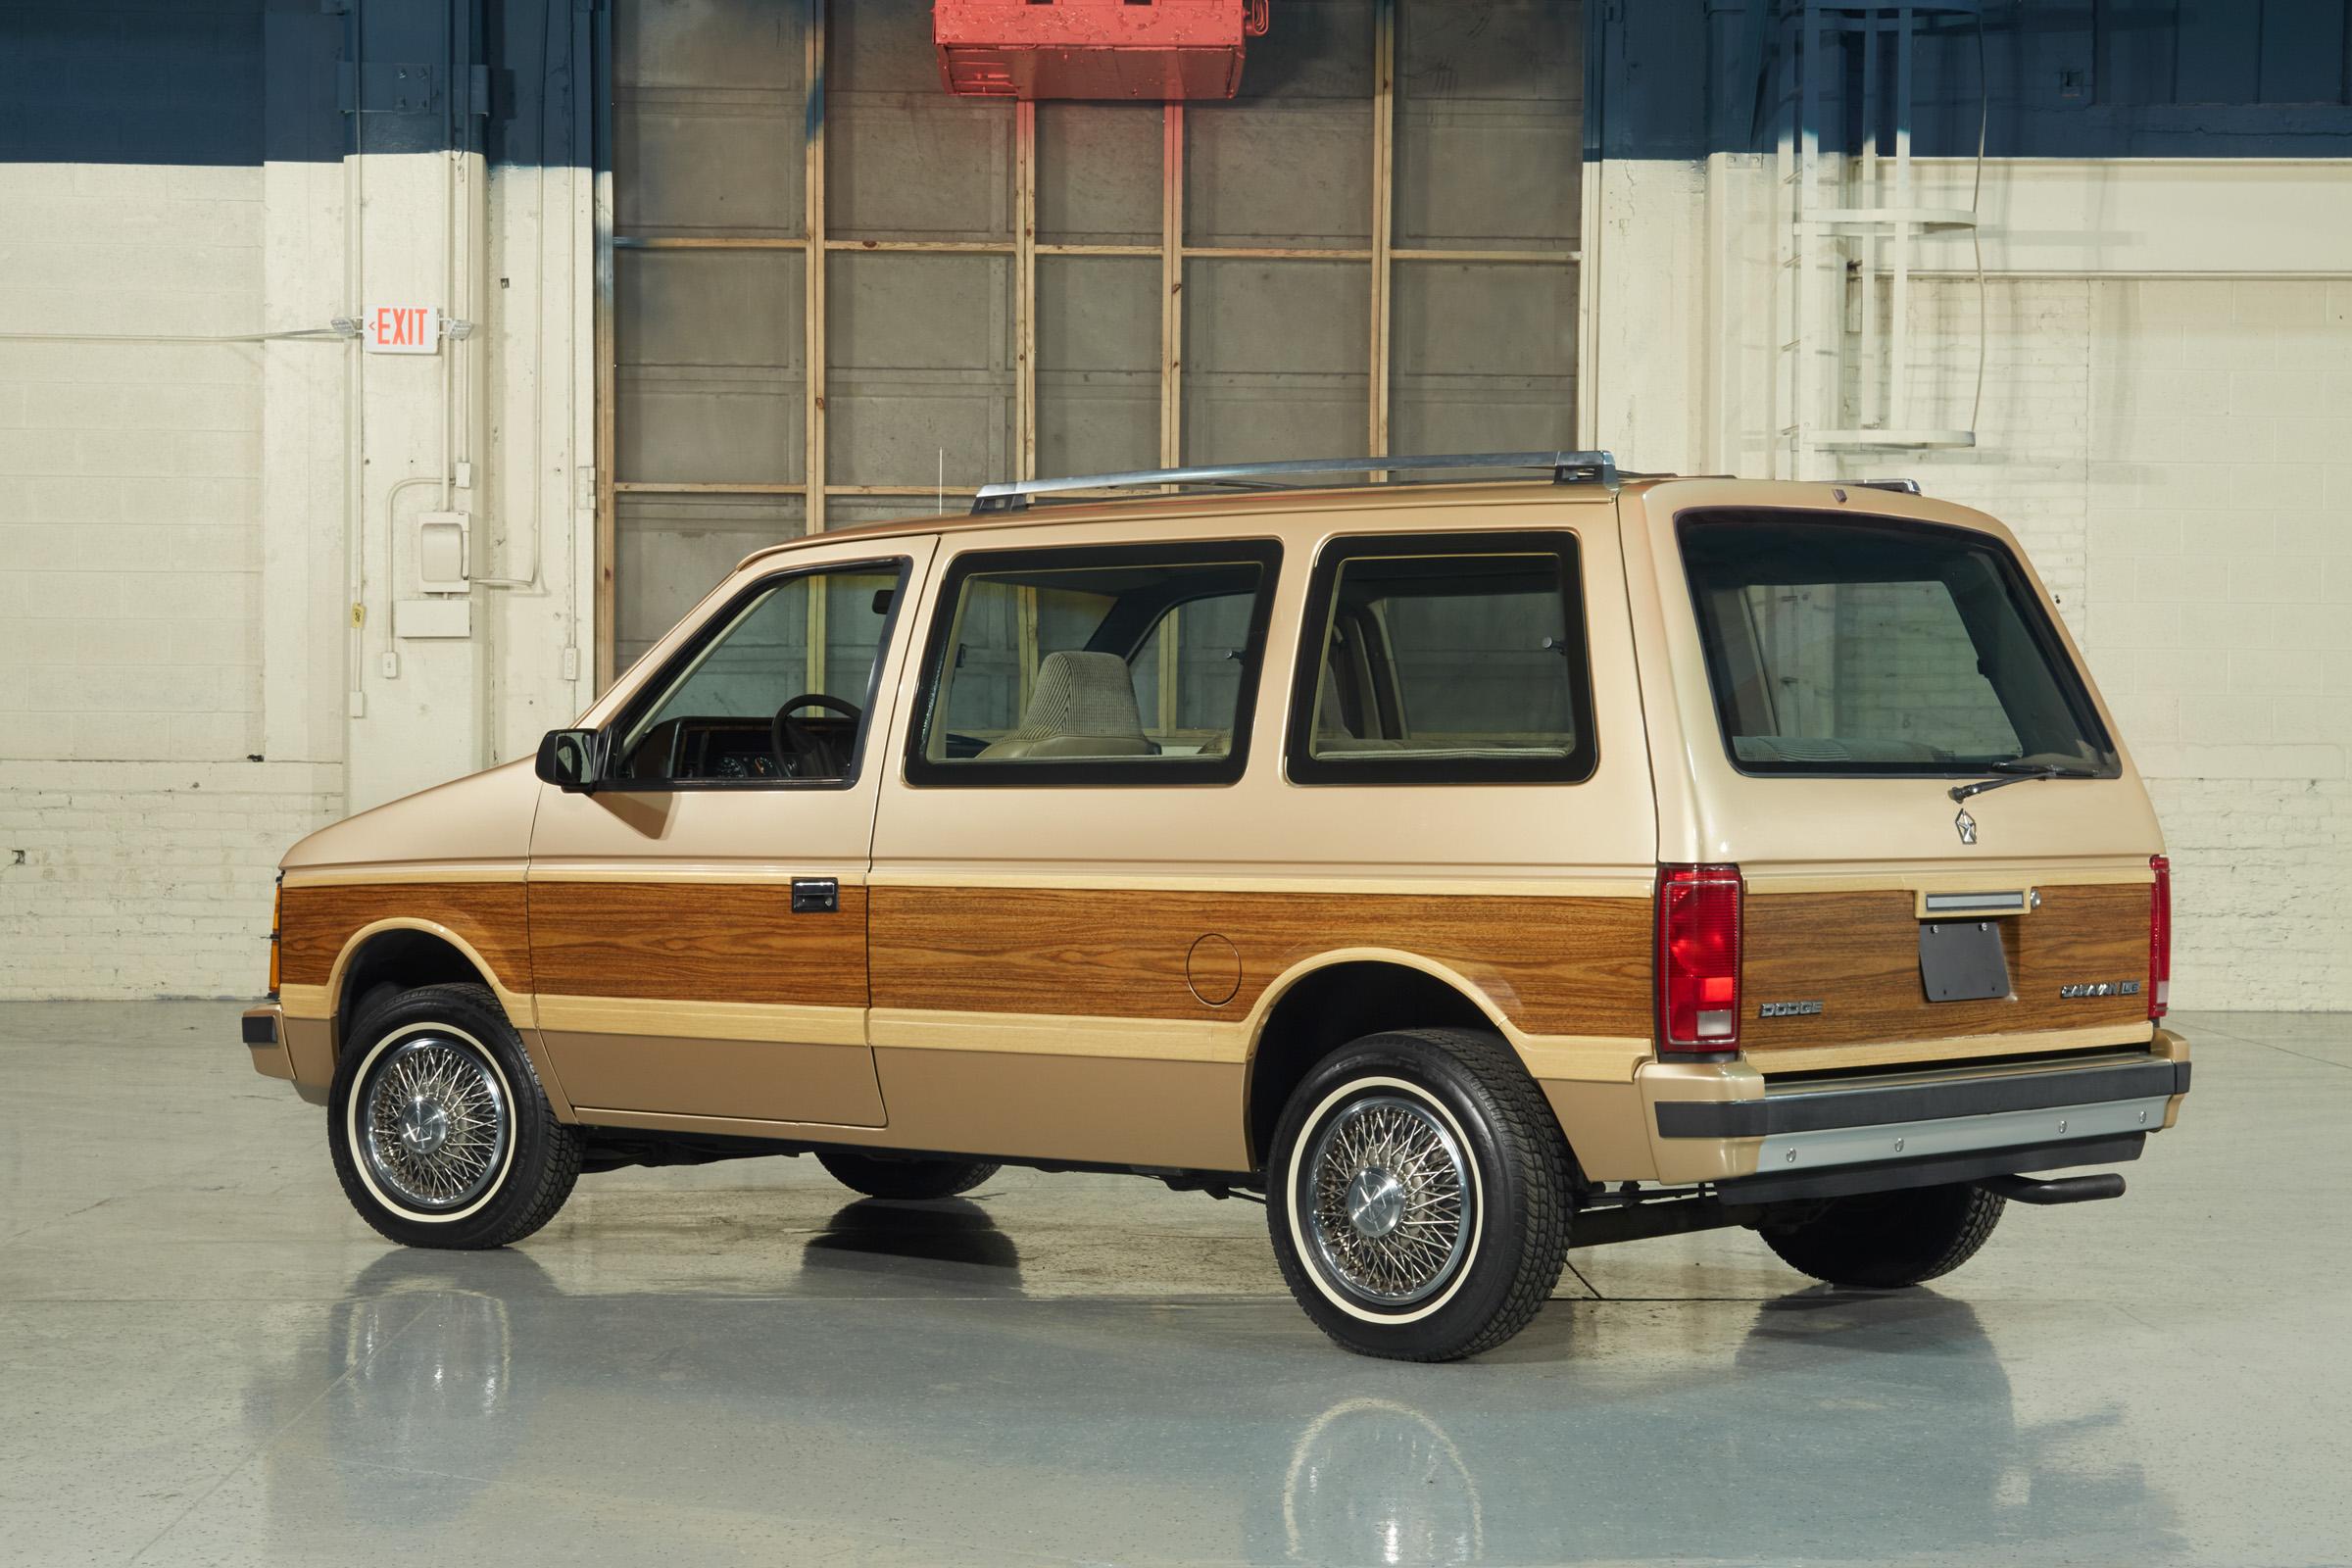 1984 Dodge Caravan rear 3/4